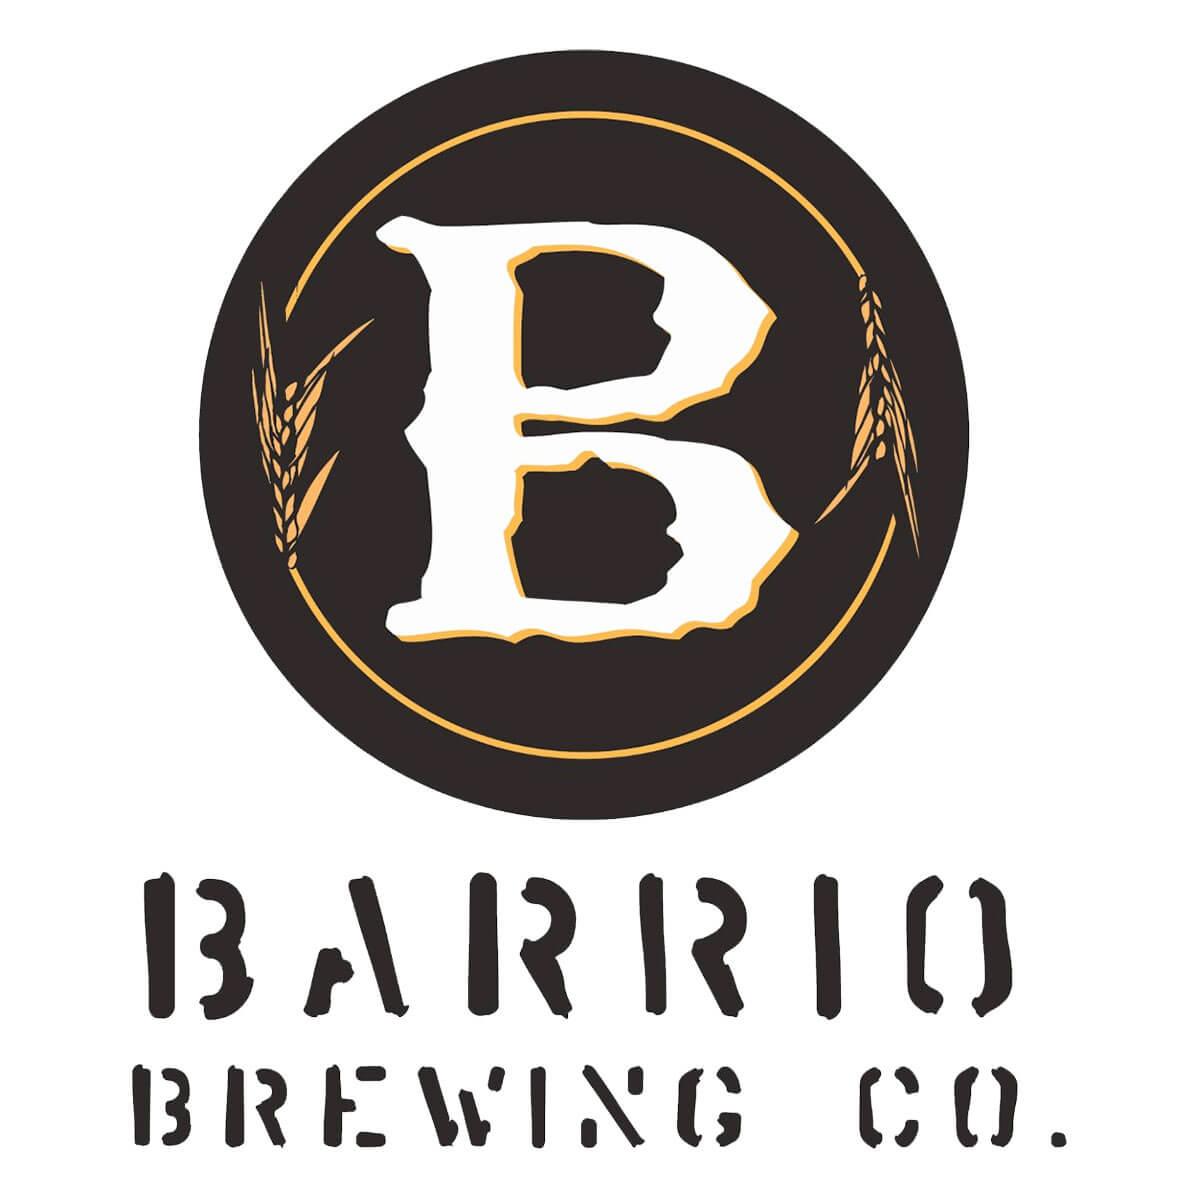 Barrio Citrazona IPA - Barrio Brewing Co. - Absolute Beer